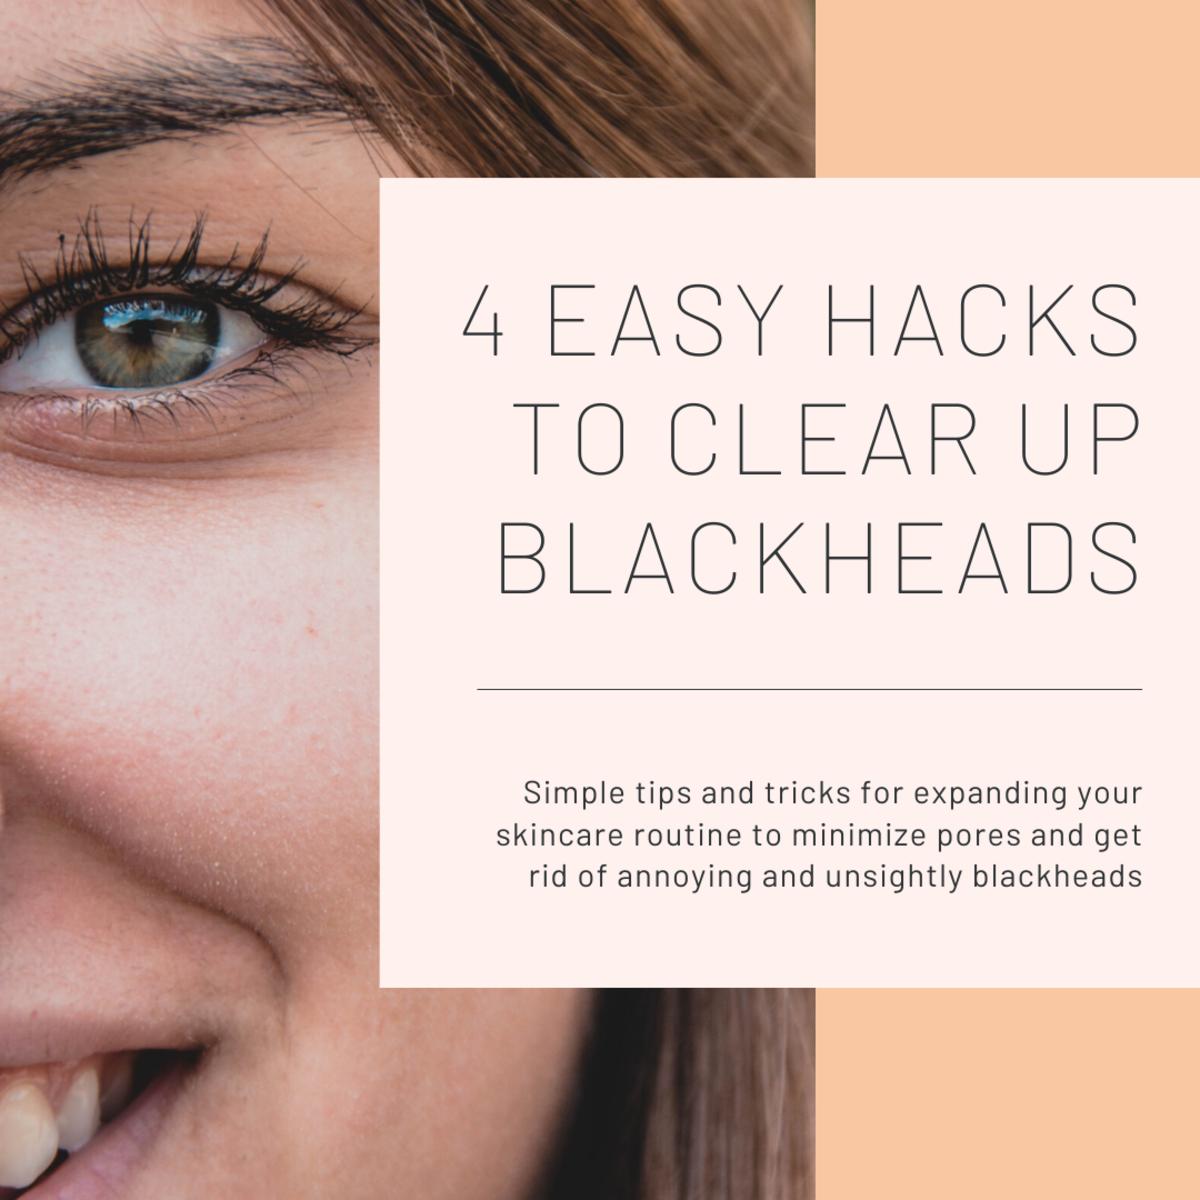 4 Easy Skincare Hacks for Getting Rid of Blackheads